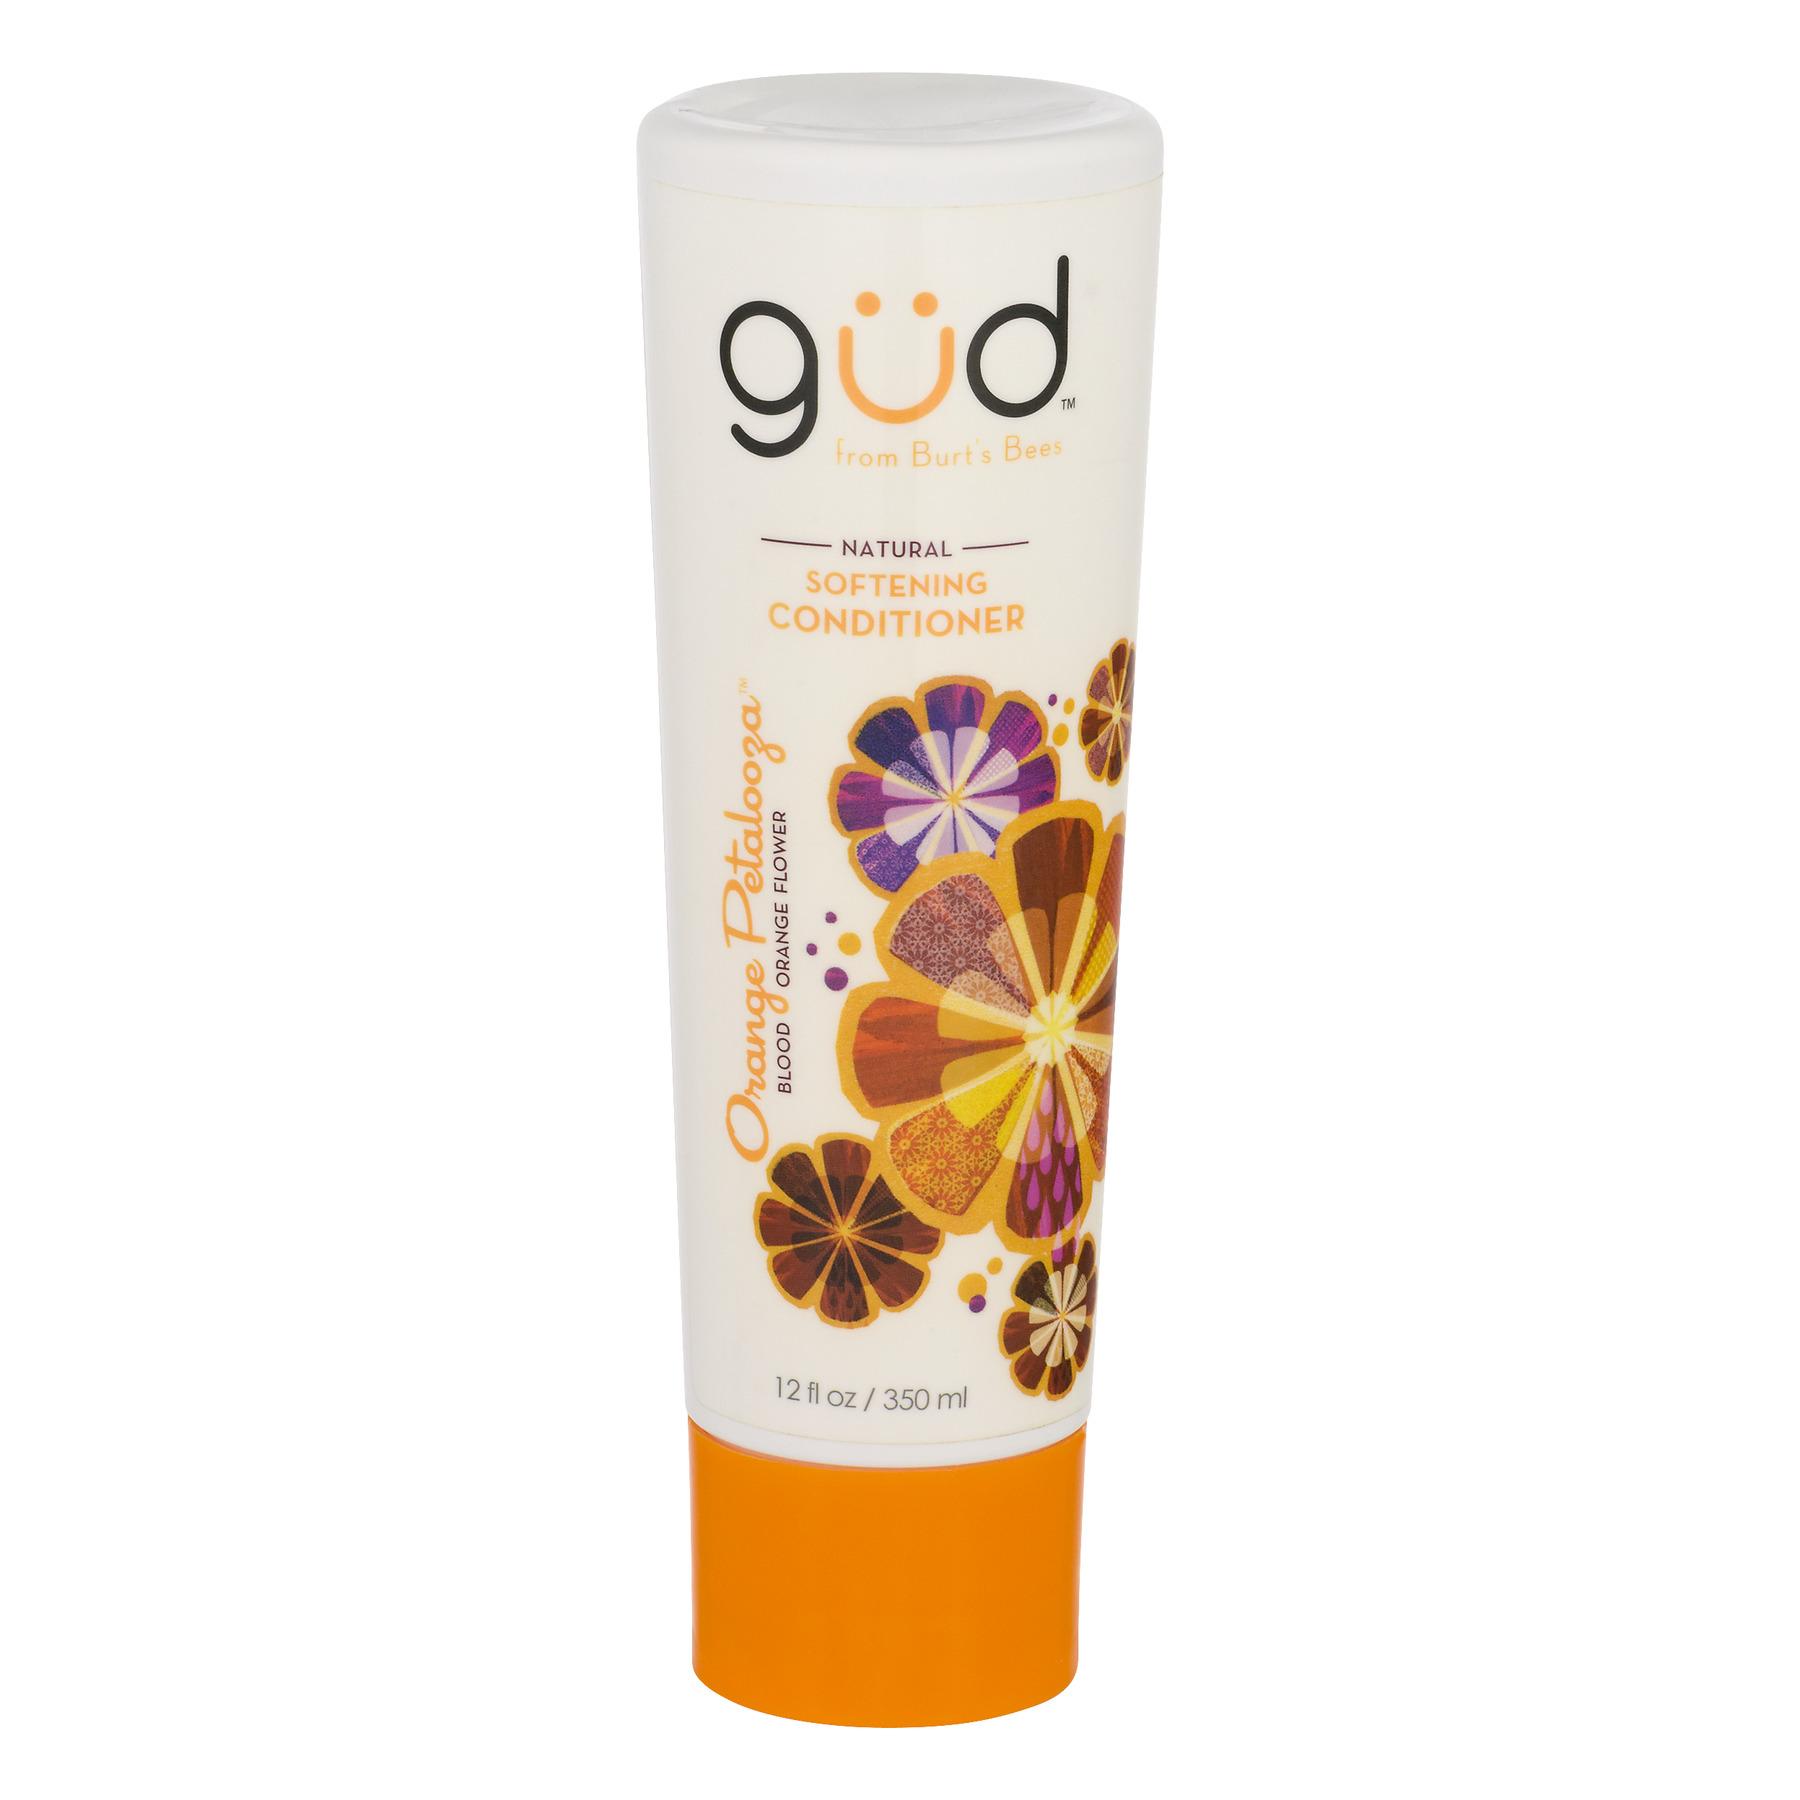 Gud Softening Conditioner Orange Petalooza, 12.0 FL OZ